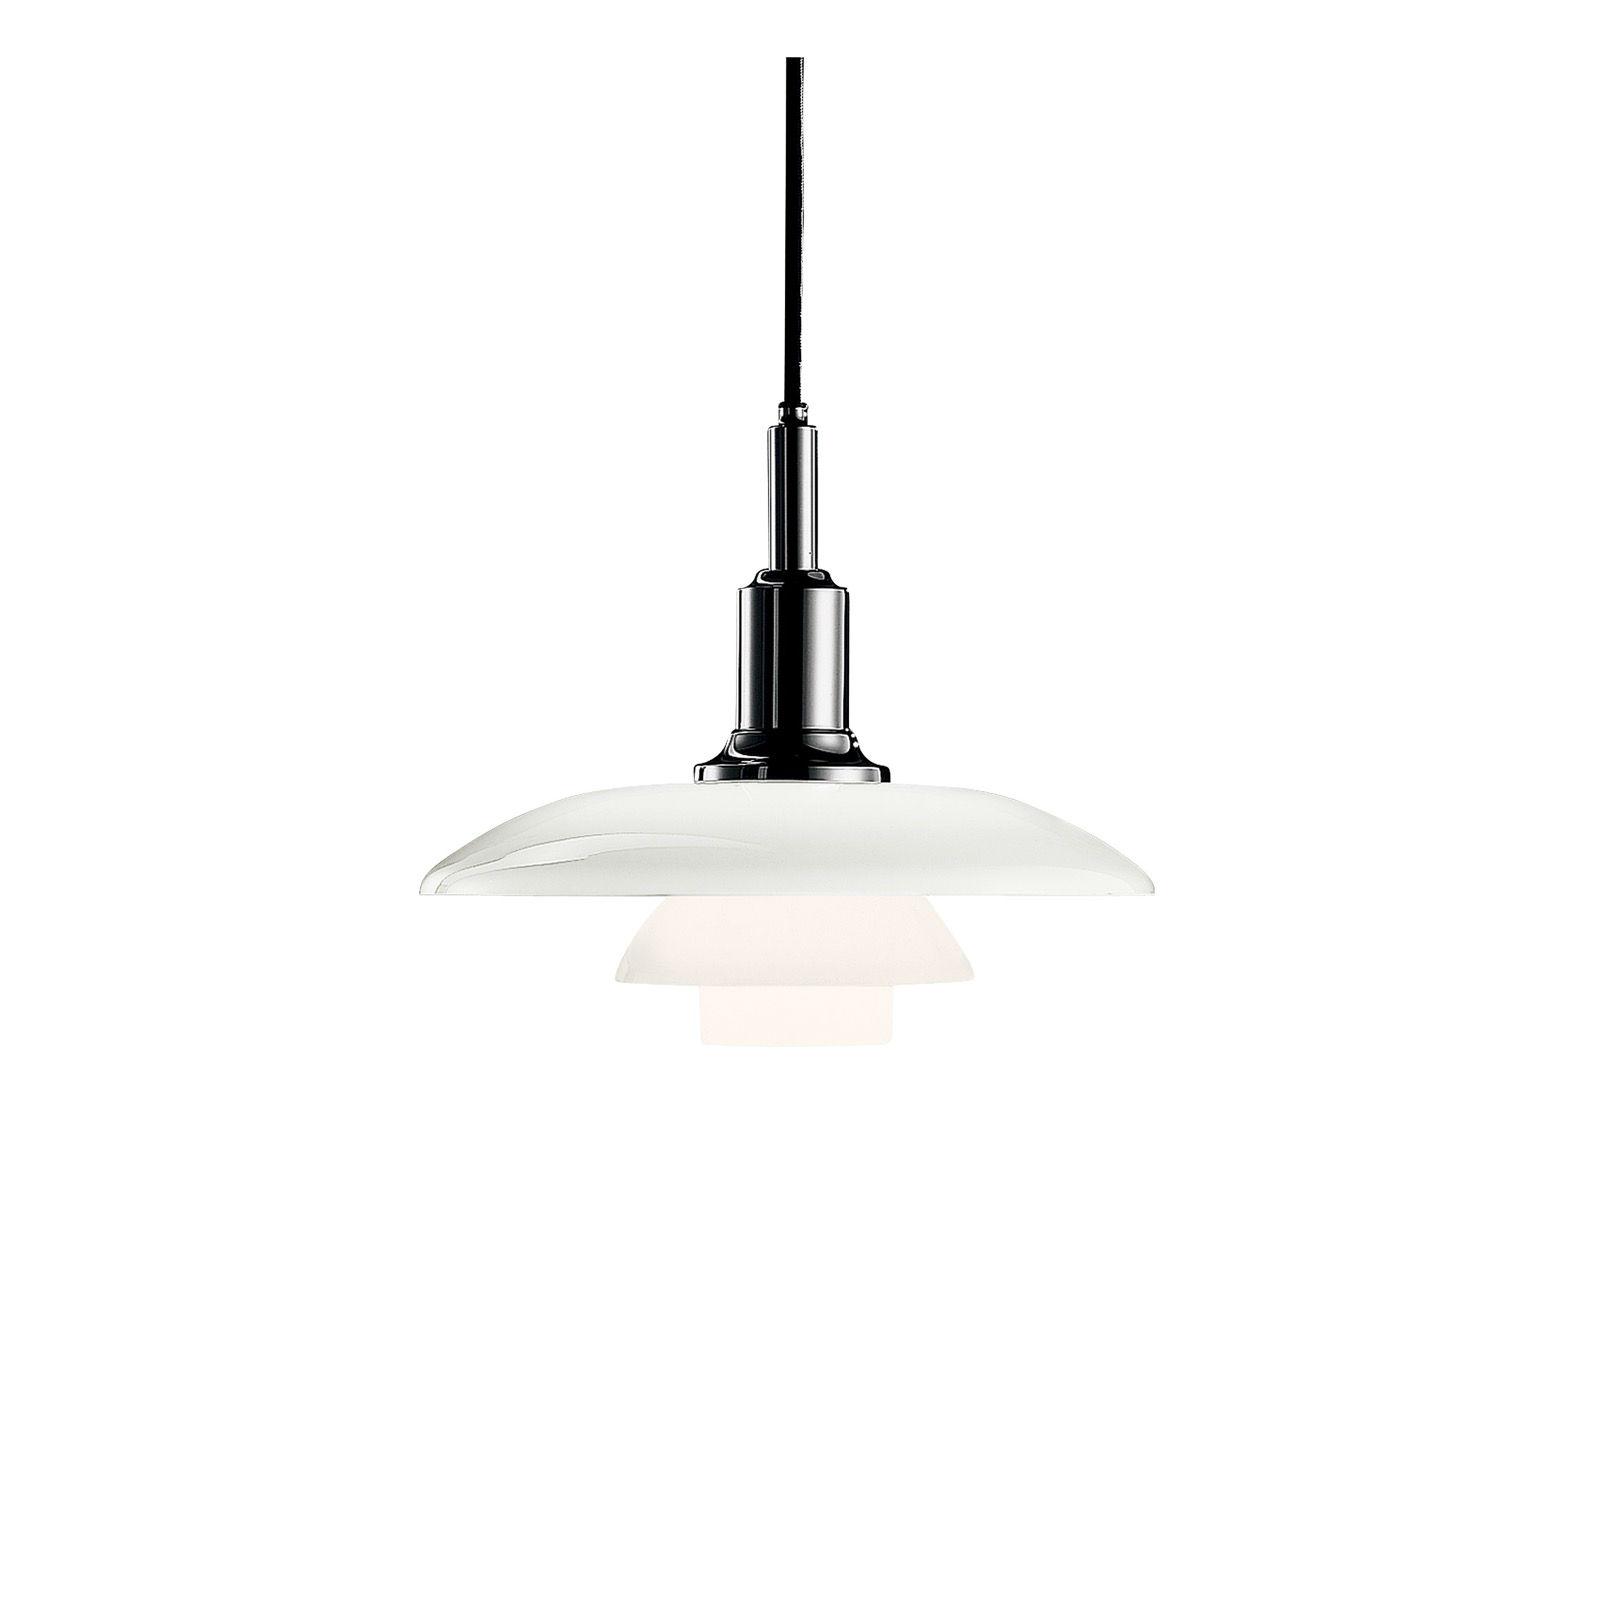 louis poulsen ph3 2 hanglamp matser wageningen. Black Bedroom Furniture Sets. Home Design Ideas